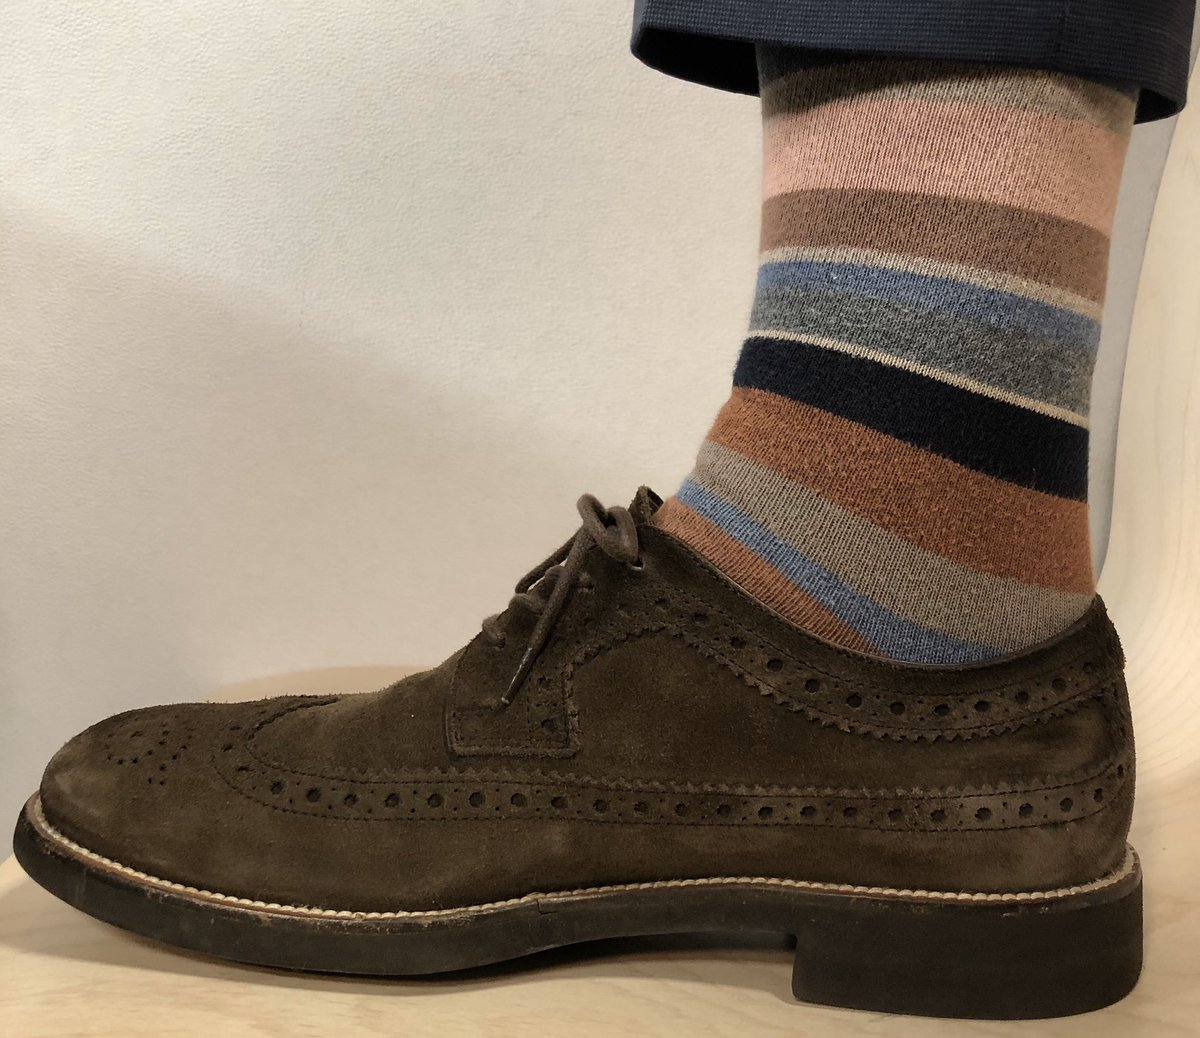 Les comparti #Losdehoy #martes #socks #lopezdoriga #joaquin #INCLUSION